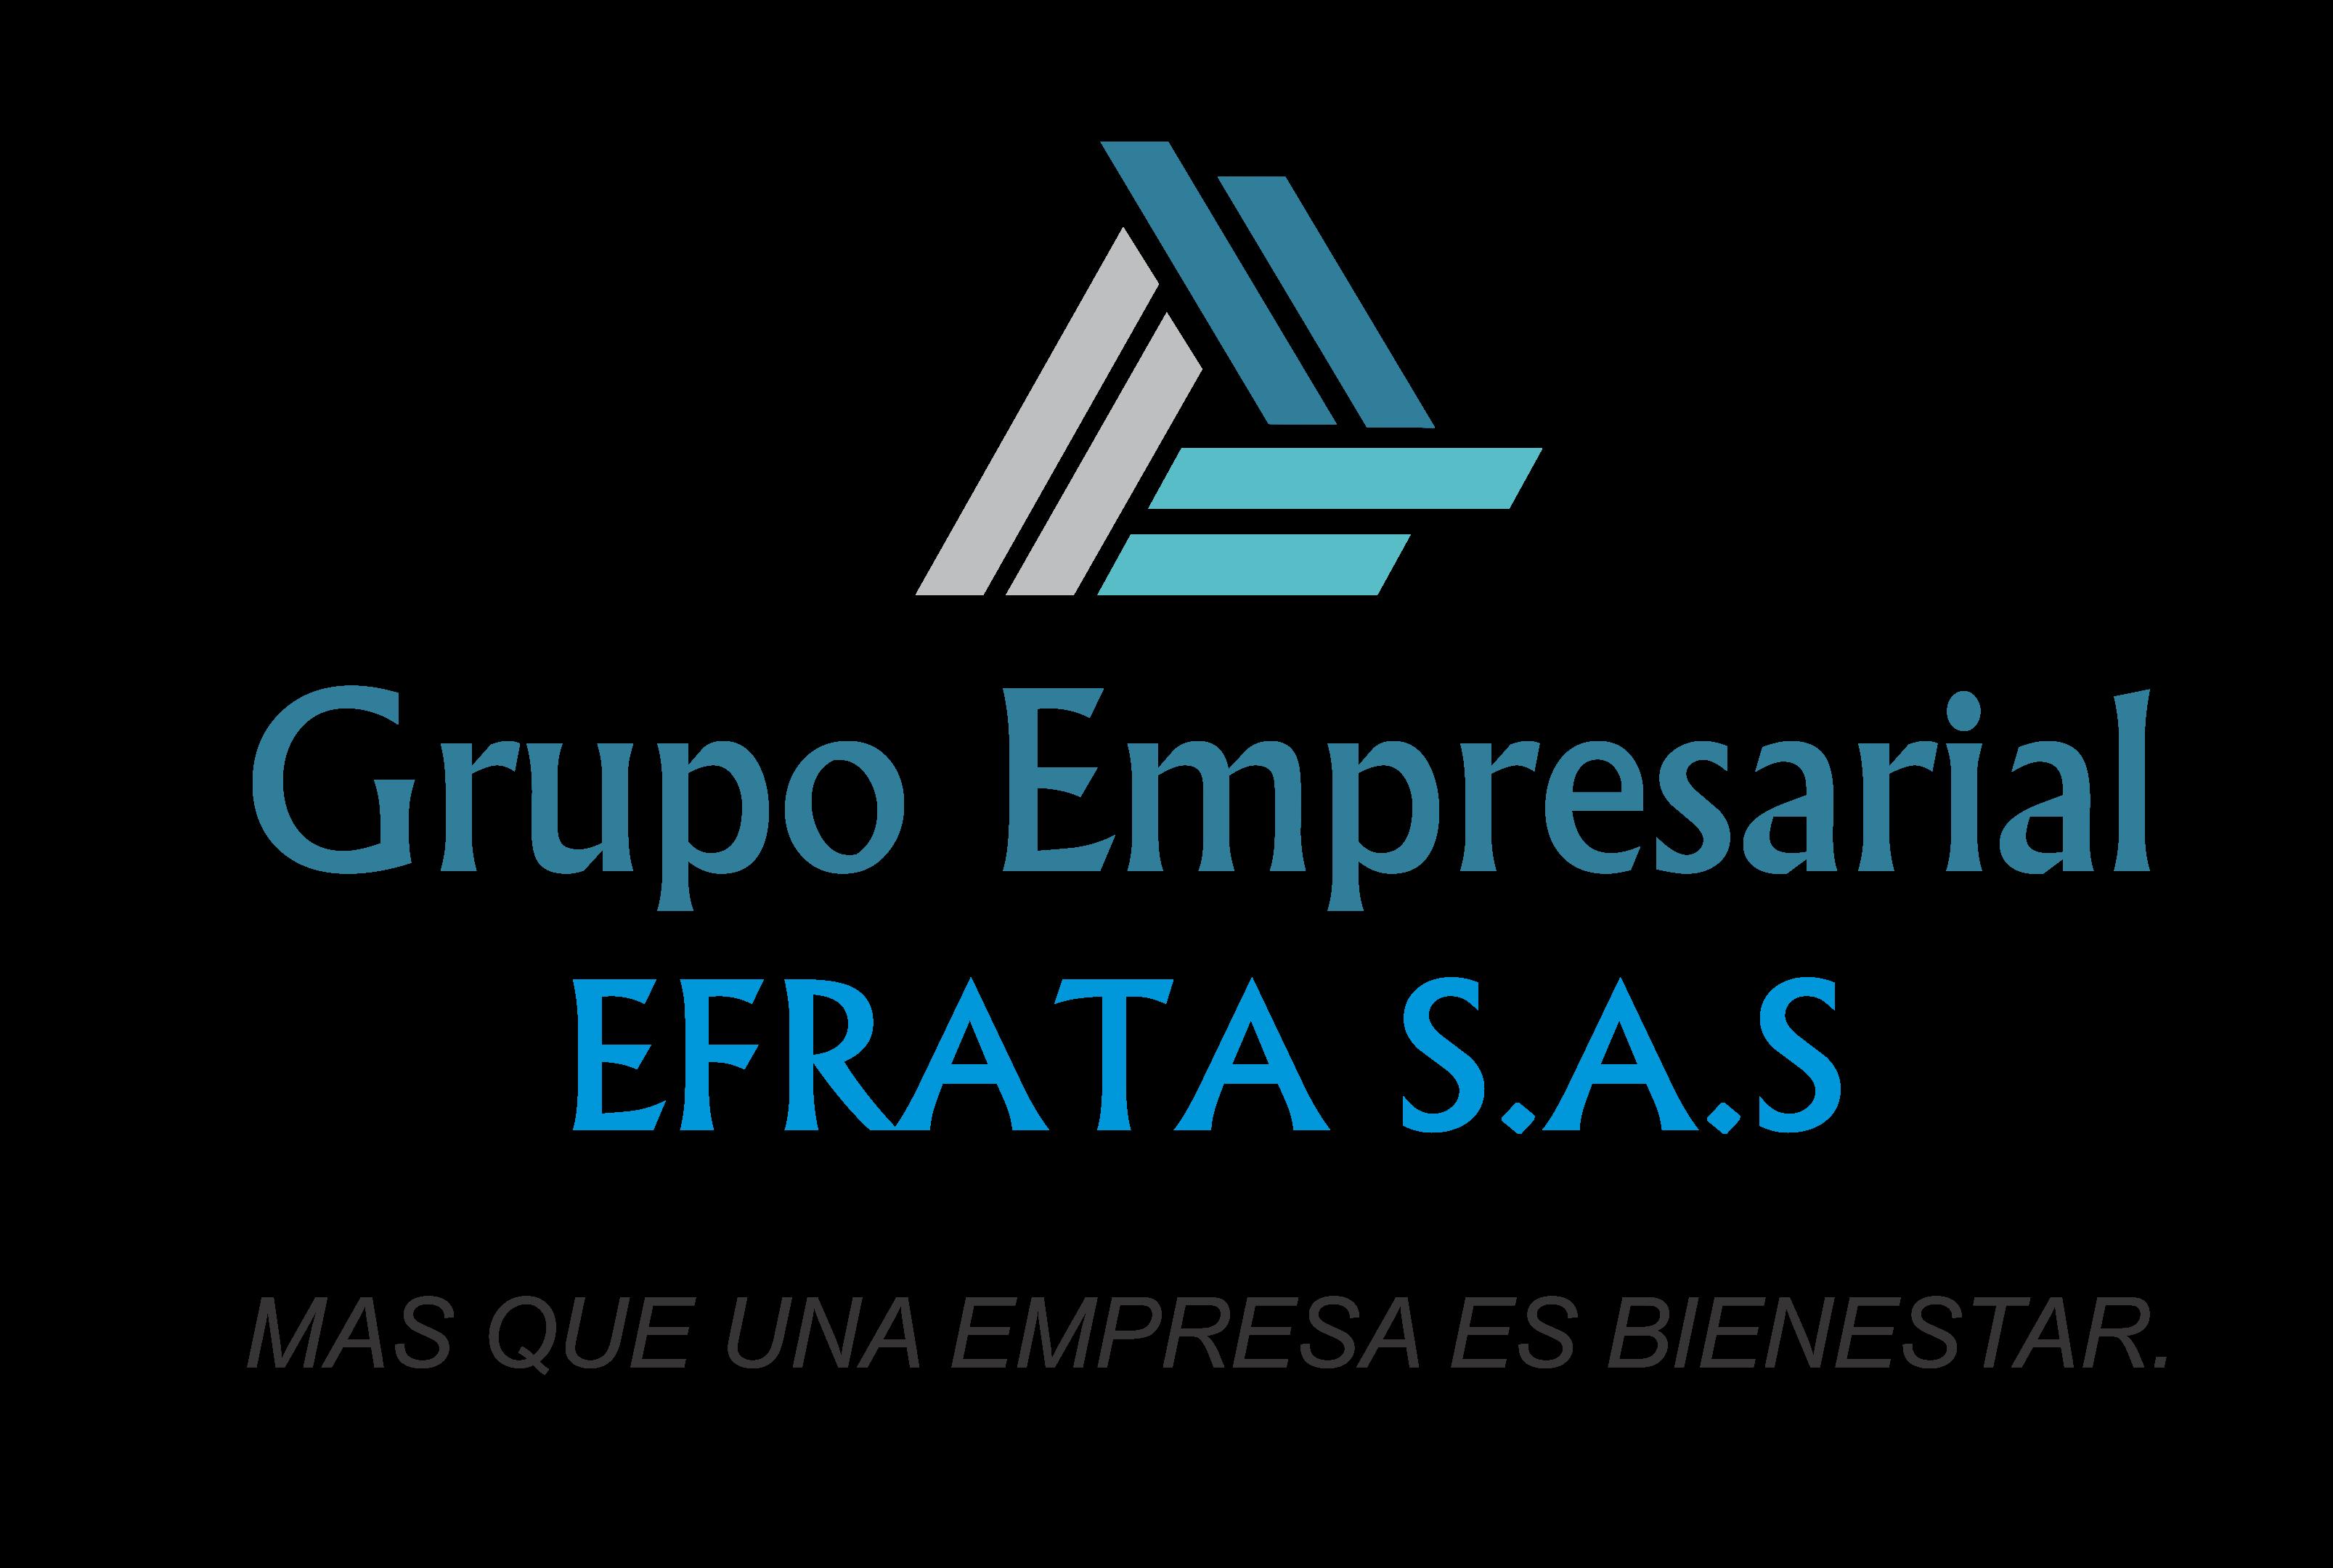 Grupo Empresarial Efrata s.a.s